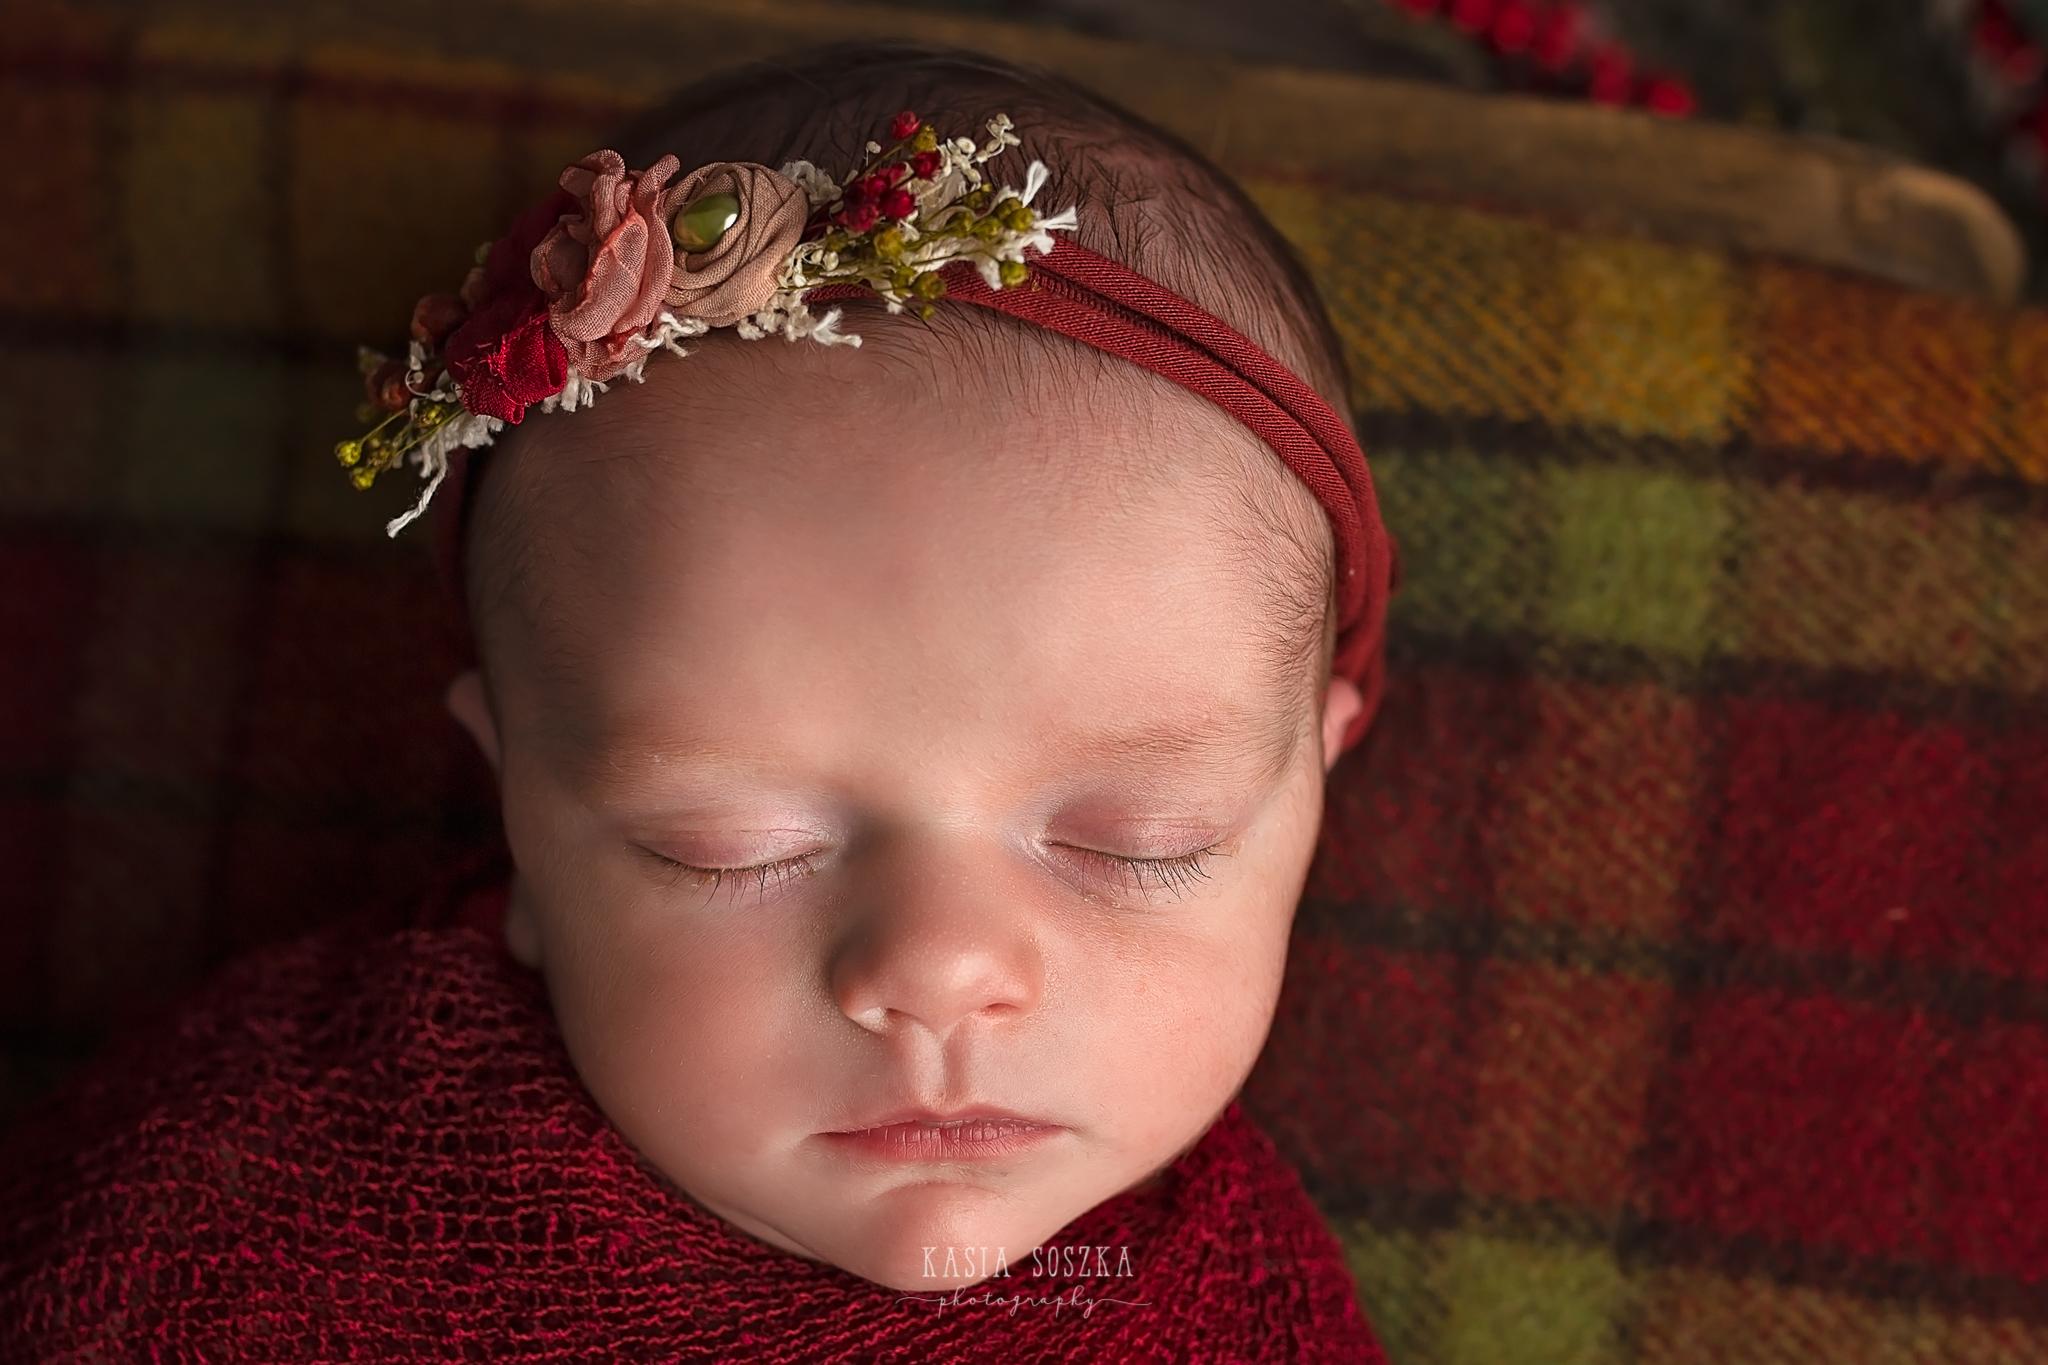 Newborn photography in Leeds near Bradford, York and Harrogate: close up of a cute newborn baby girl in Christmas set up